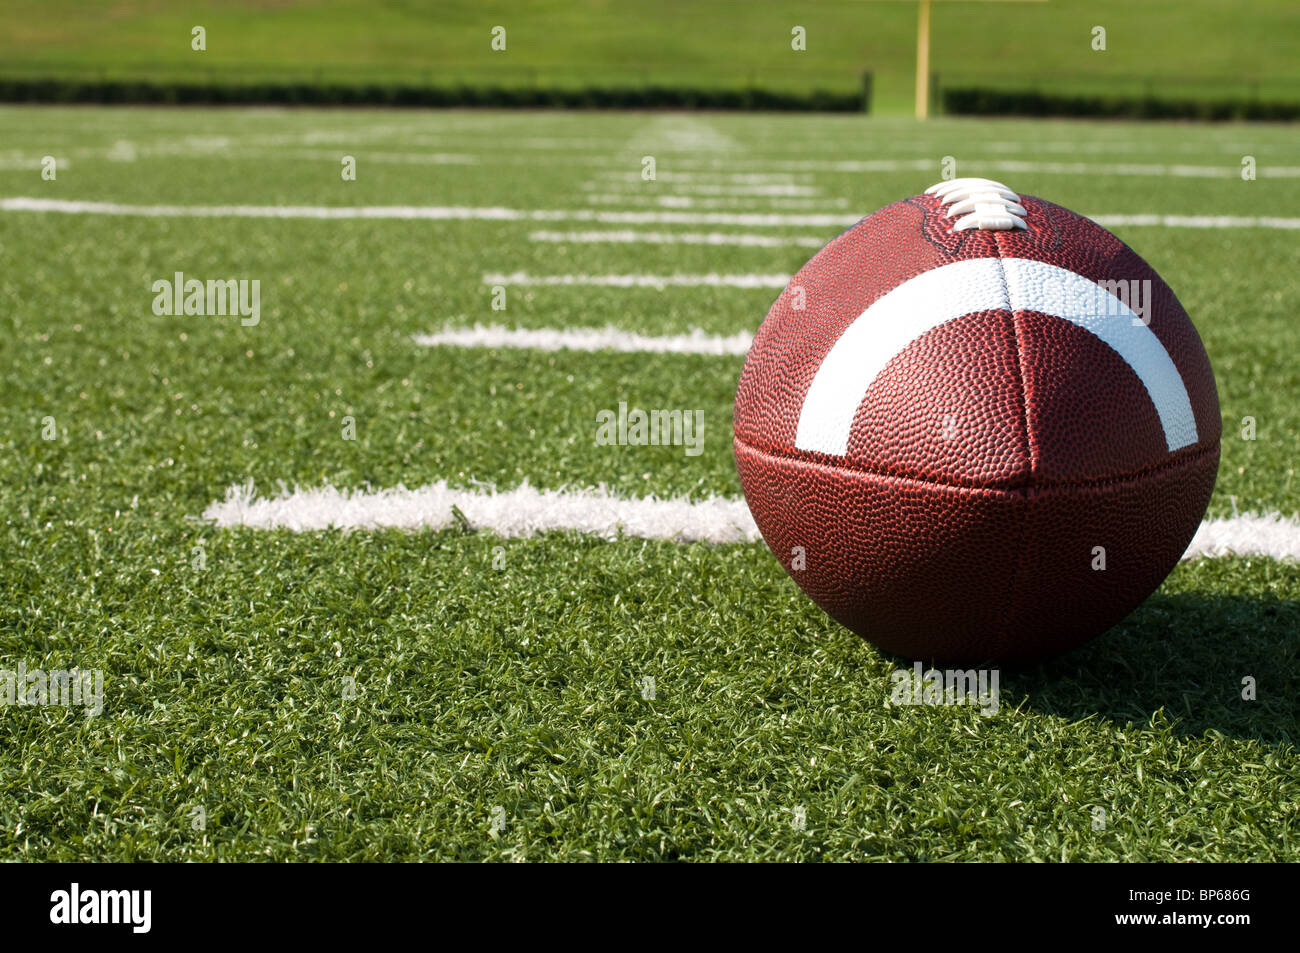 Closeup of American football on field. - Stock Image